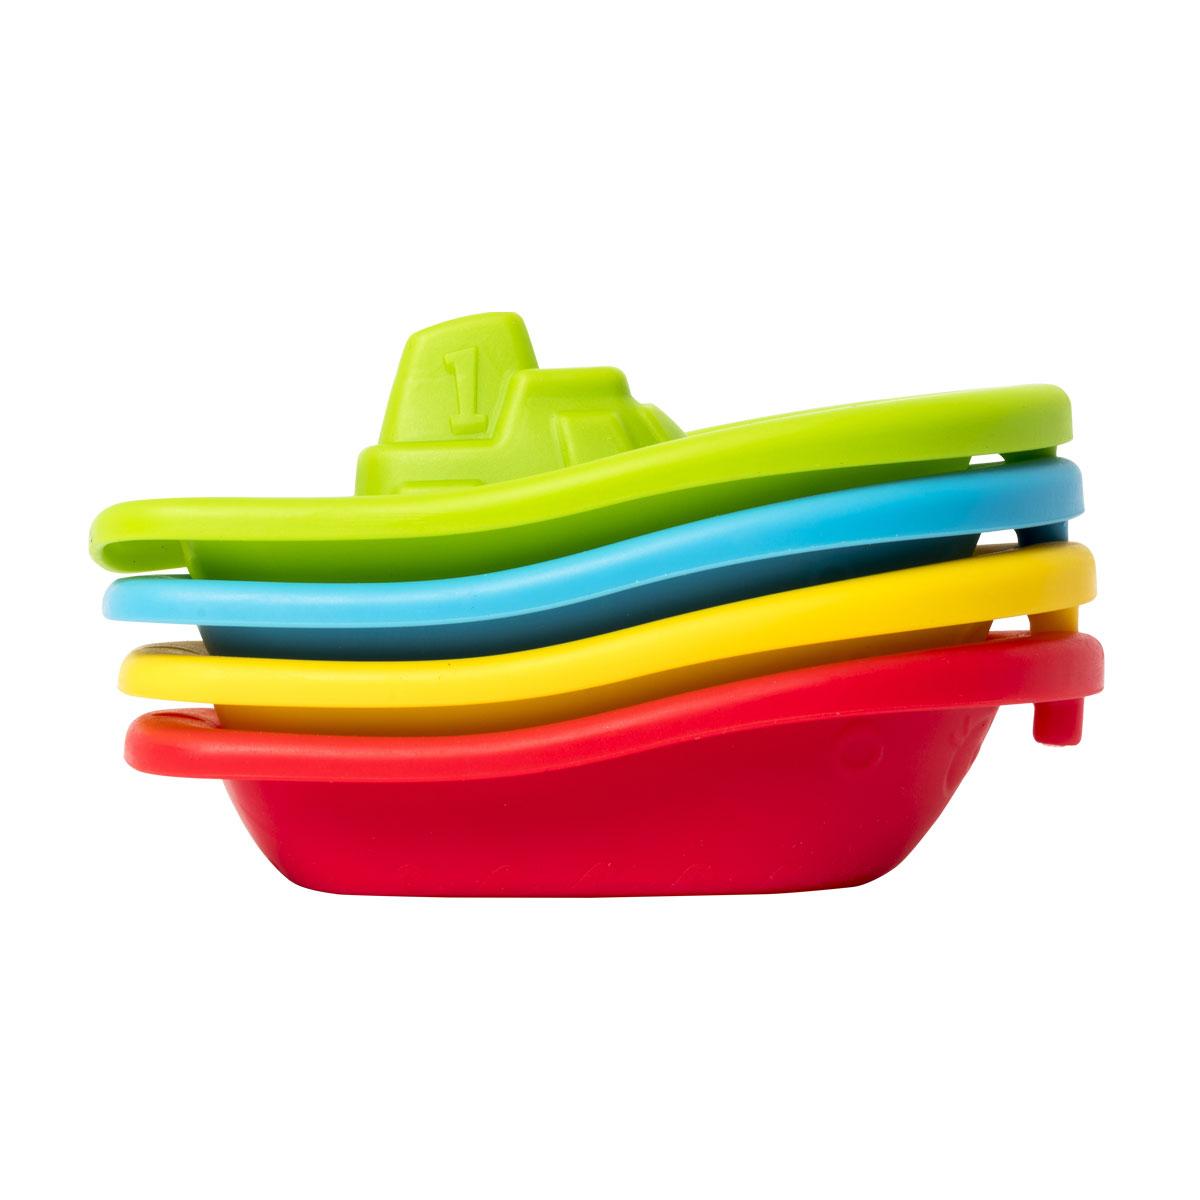 Bateaux de bain farandole